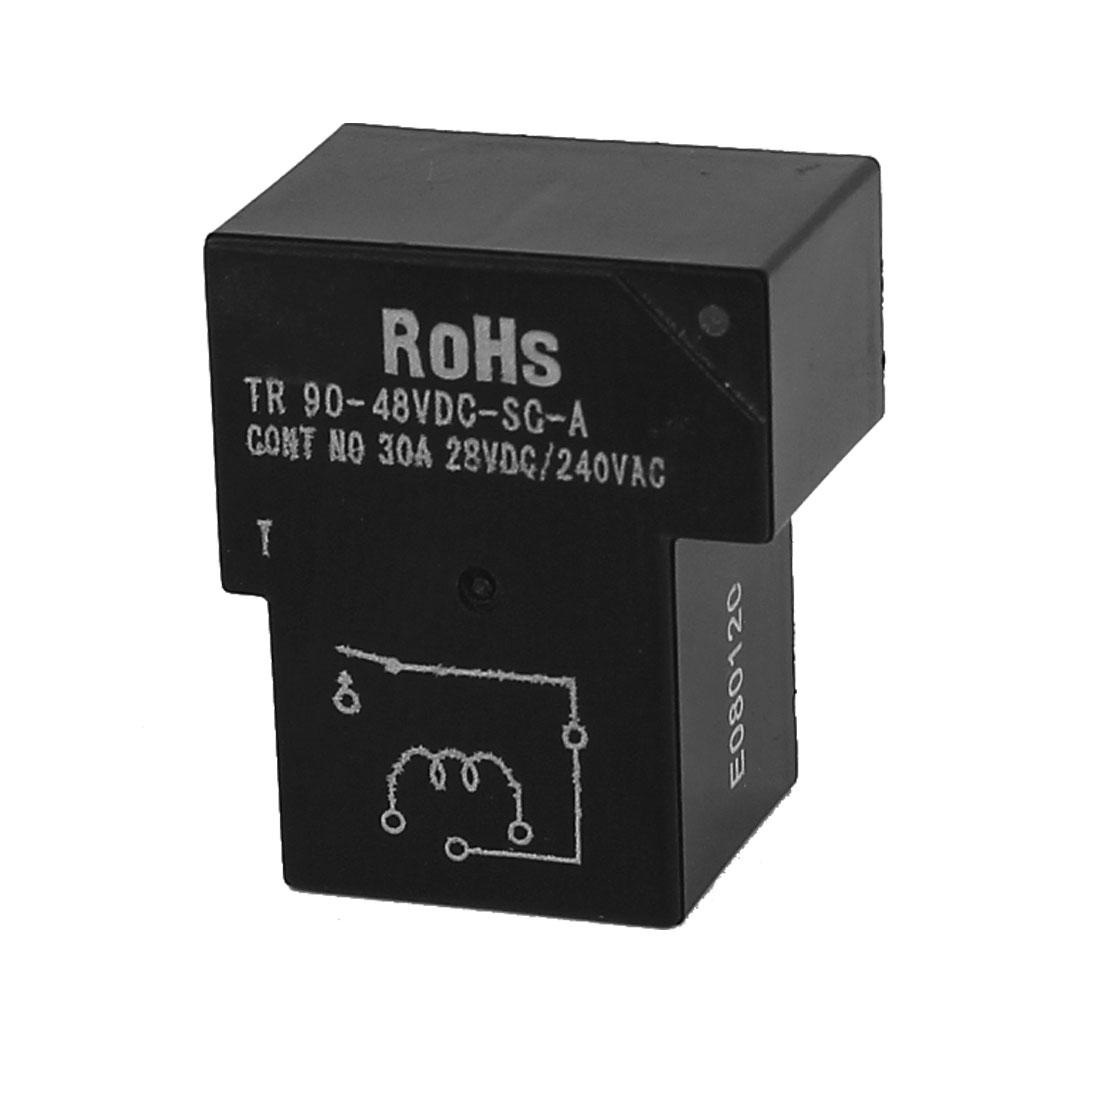 DC 48V Coil 5 Pins Terminal 1NO PCB Mount Electromagnetic Power Relays TR90-48VDC-SC-A